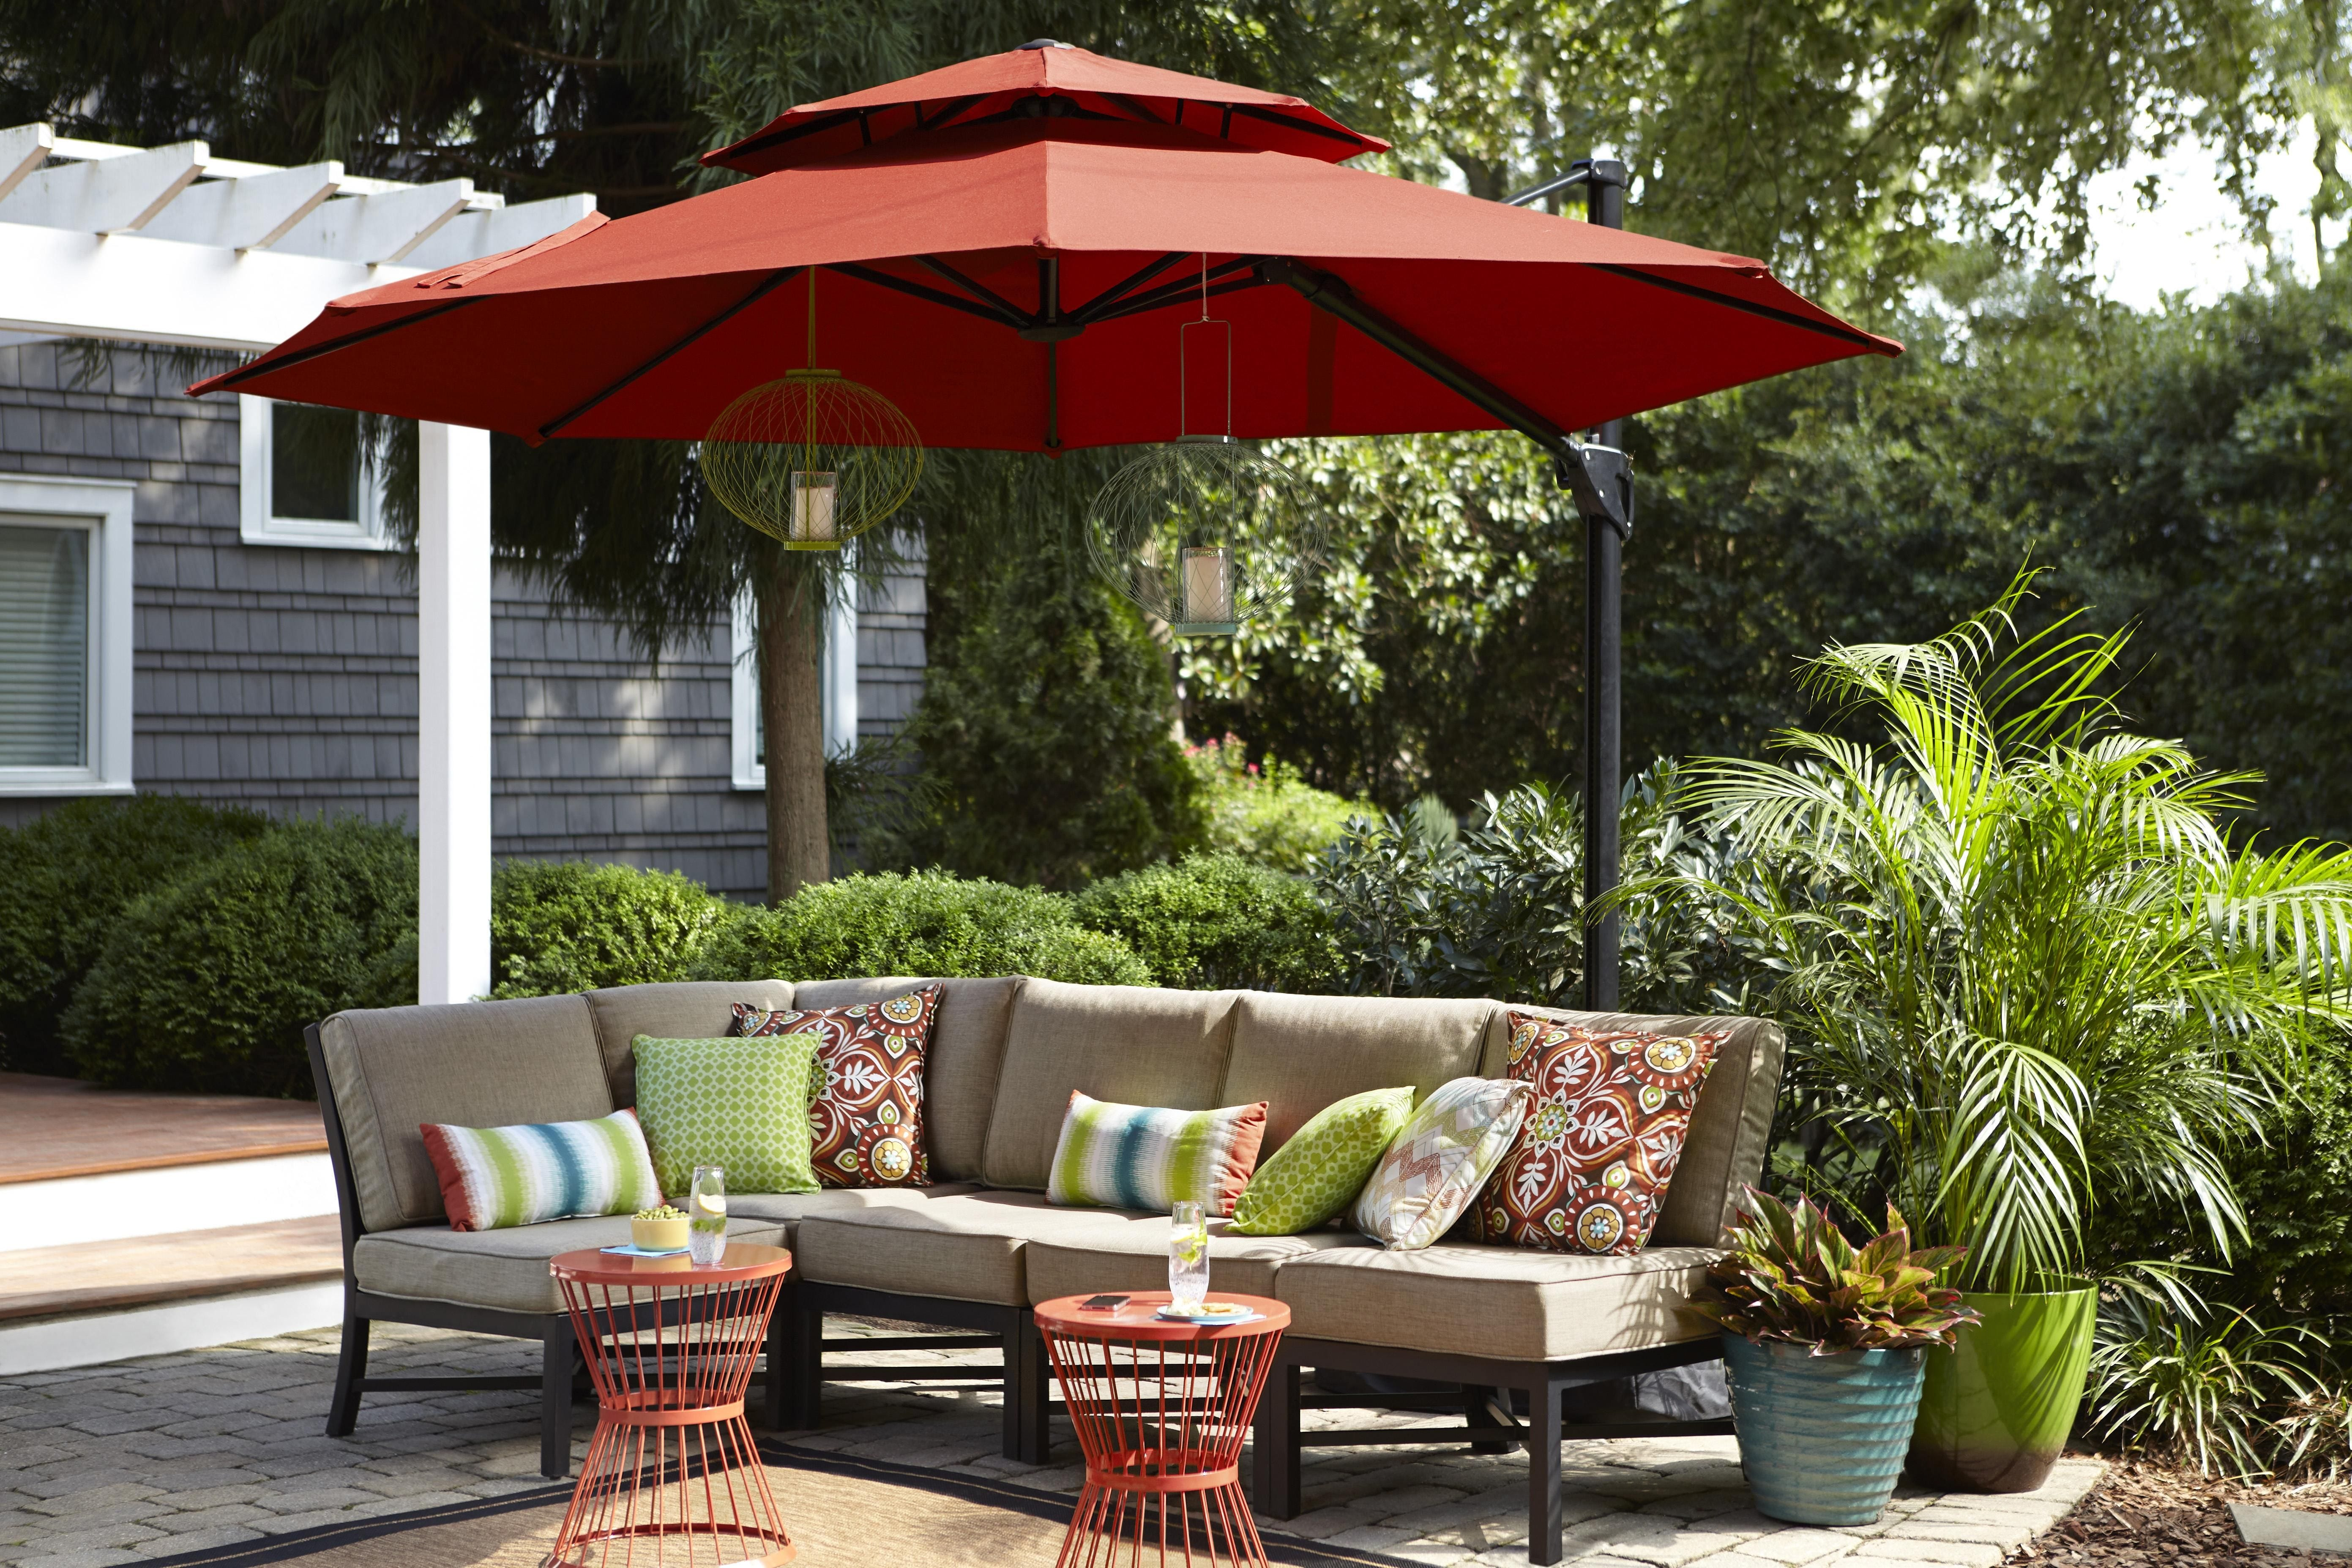 Garden Treasures Red Offset Patio Umbrella. (Photo: COURTESY OF LOWEu0027S)